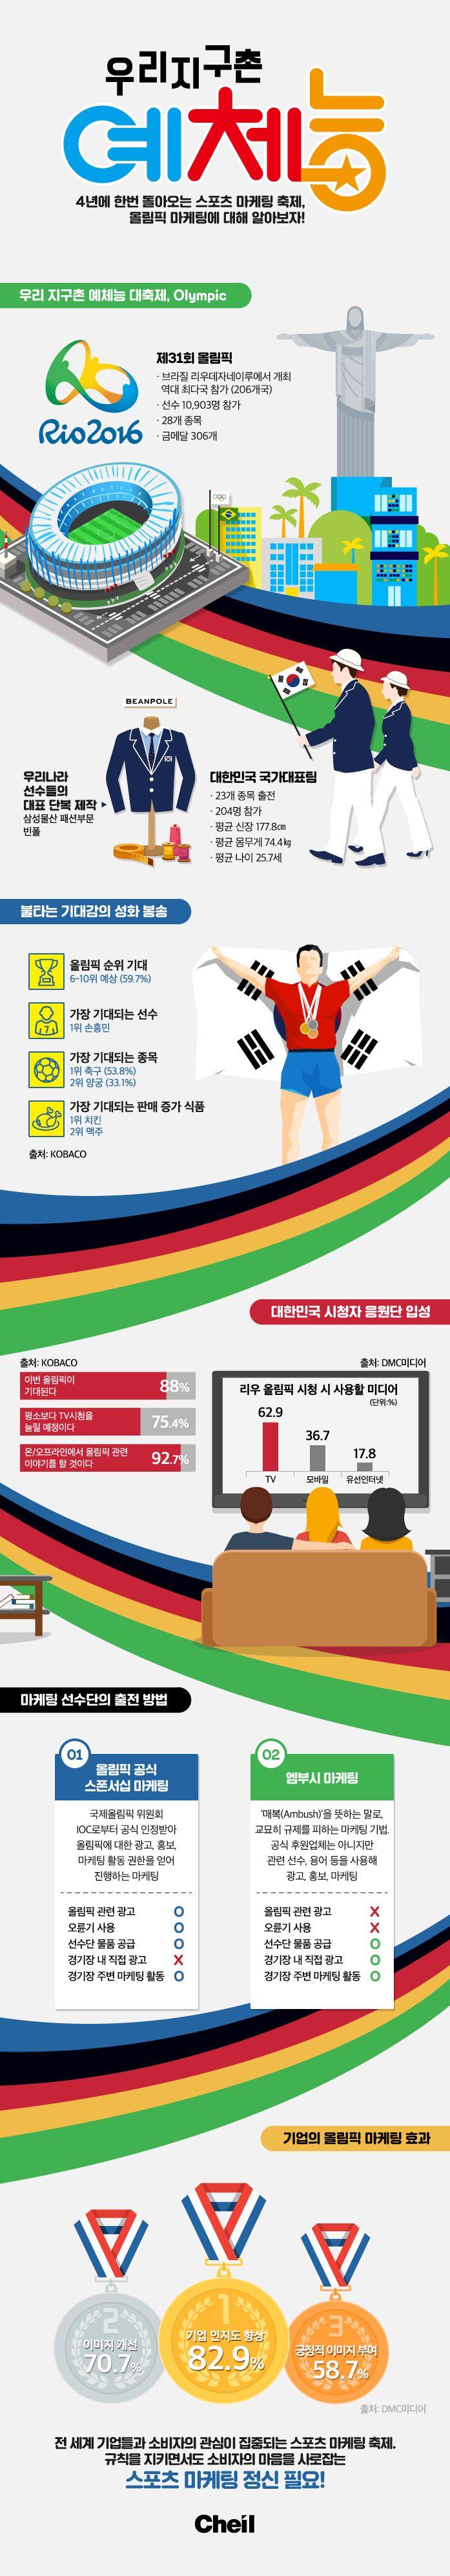 [Infographic] 리우 올림픽과 마케팅에 관한 인포그래픽